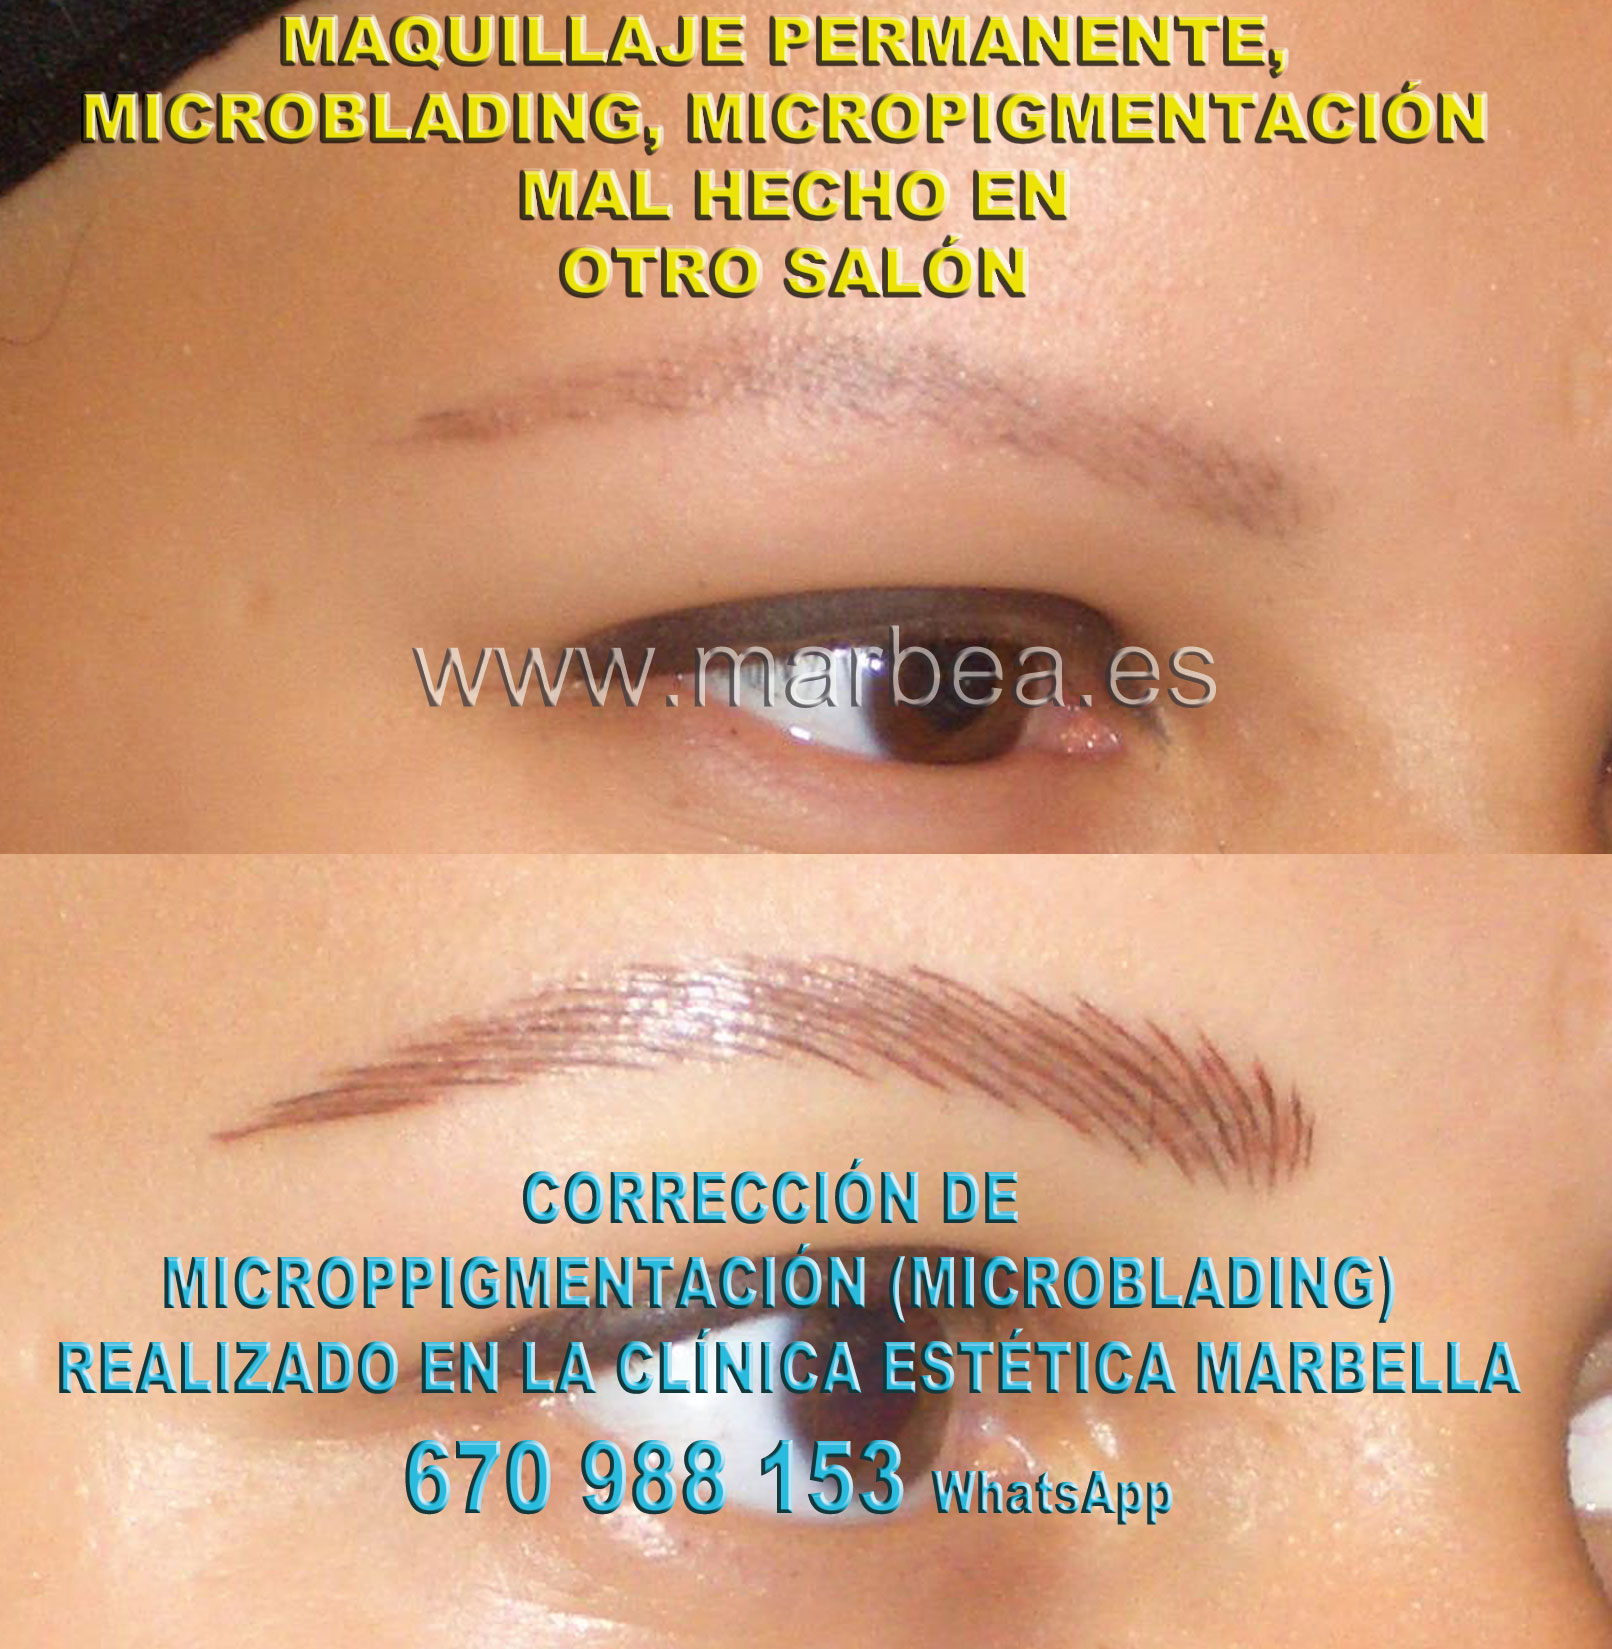 QUITAR TATUAJE CEJAS clínica estética maquillaje permanete entrega como aclarar la micropigmentación cejas,corregir micropigmentación mal hecha